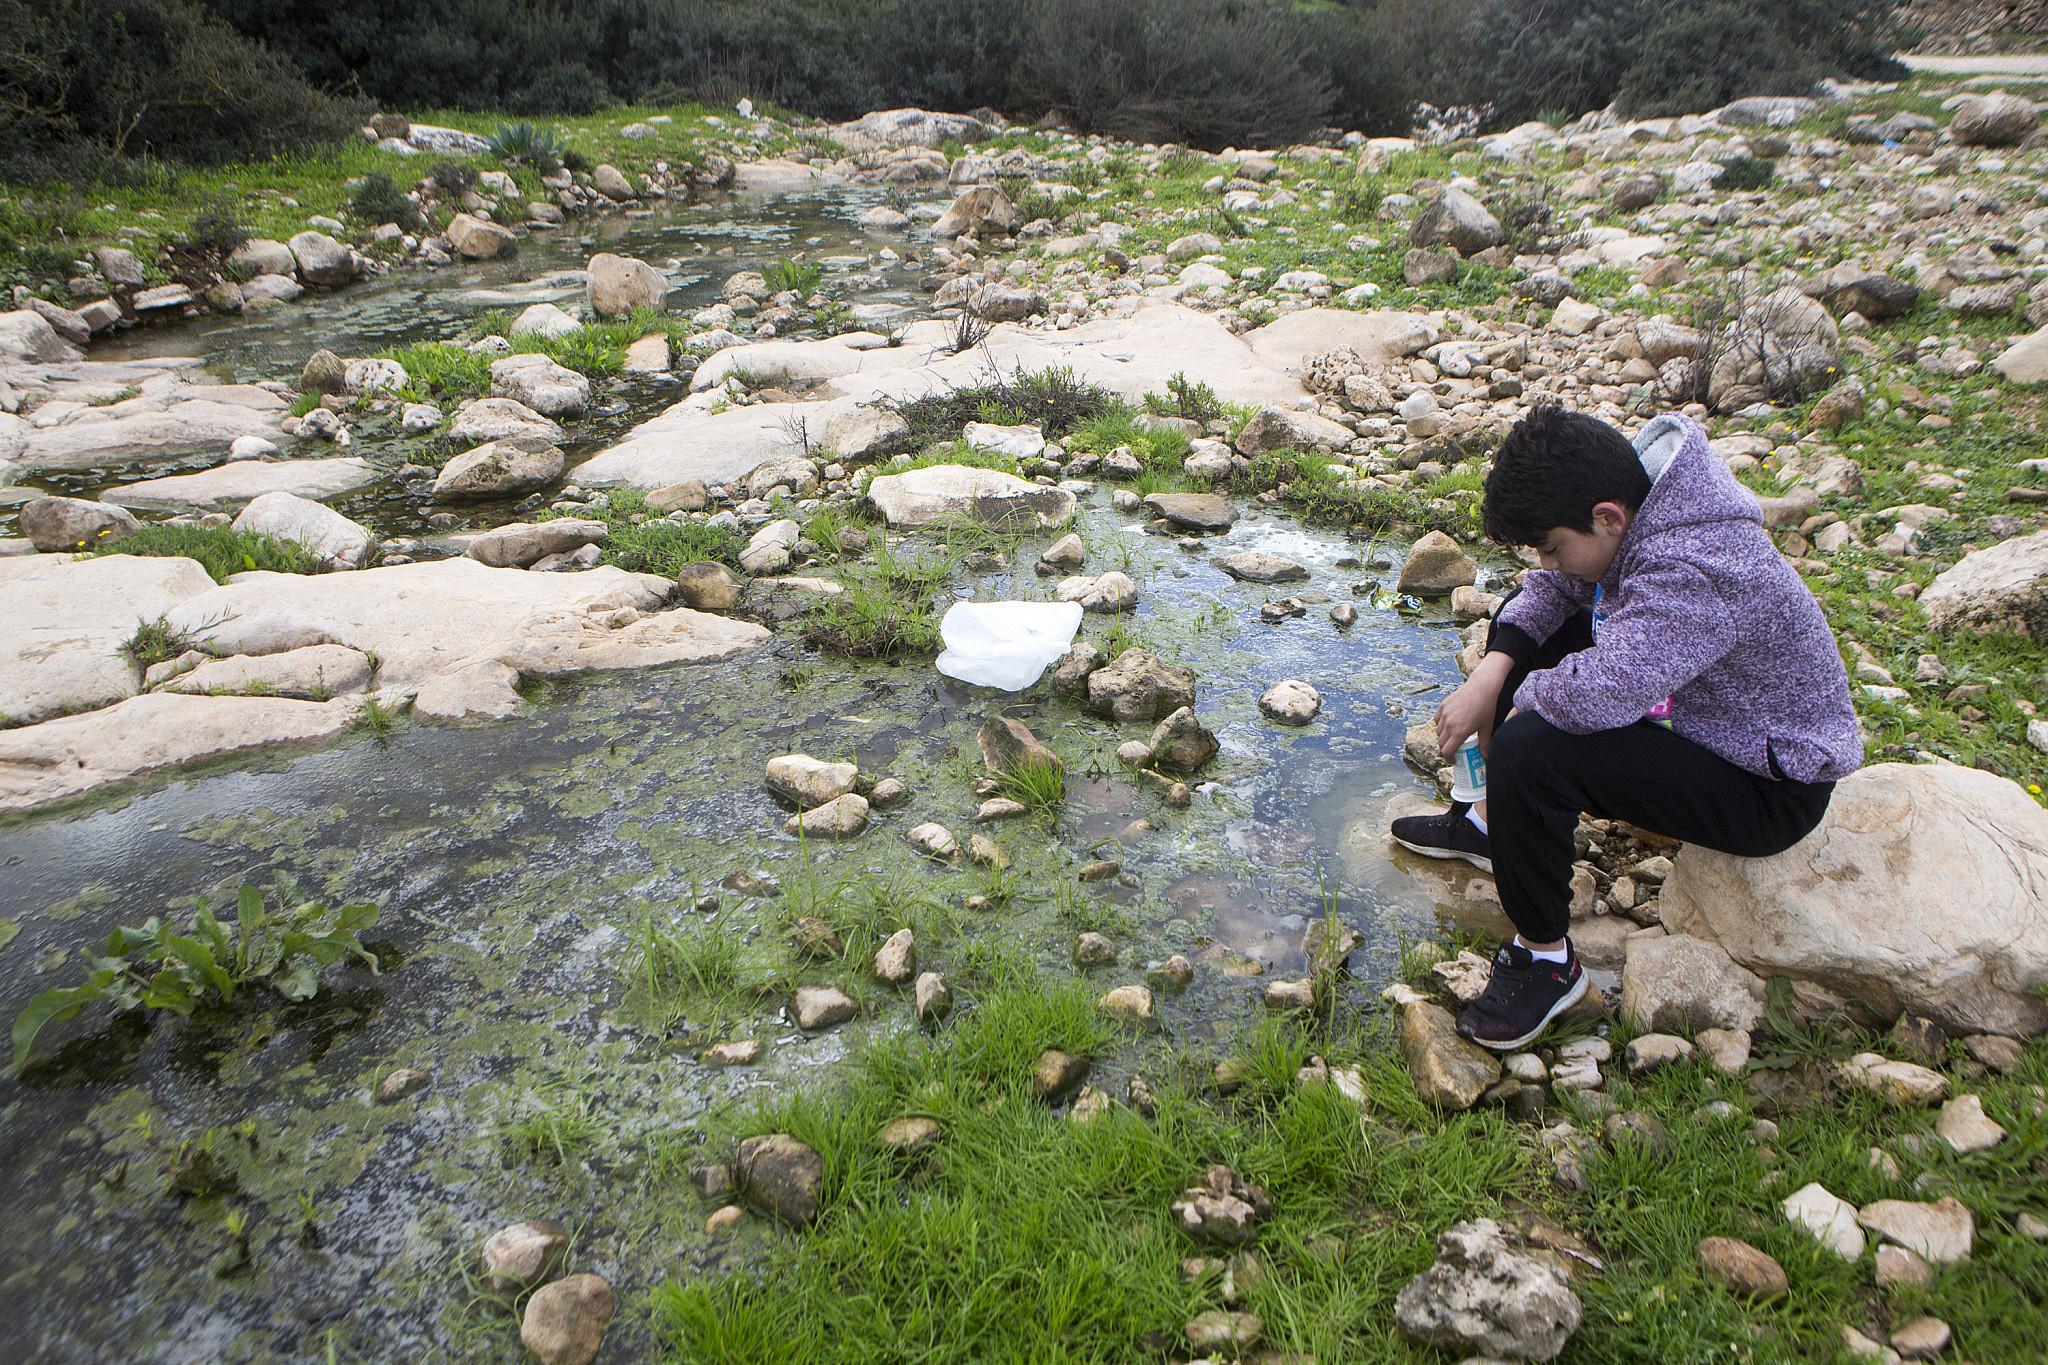 Palestinians enjoy their time in Wadi Qana valley area, near Deir Istiya, West Bank, February 8, 2019. (Anne Paq/Activestills.org)